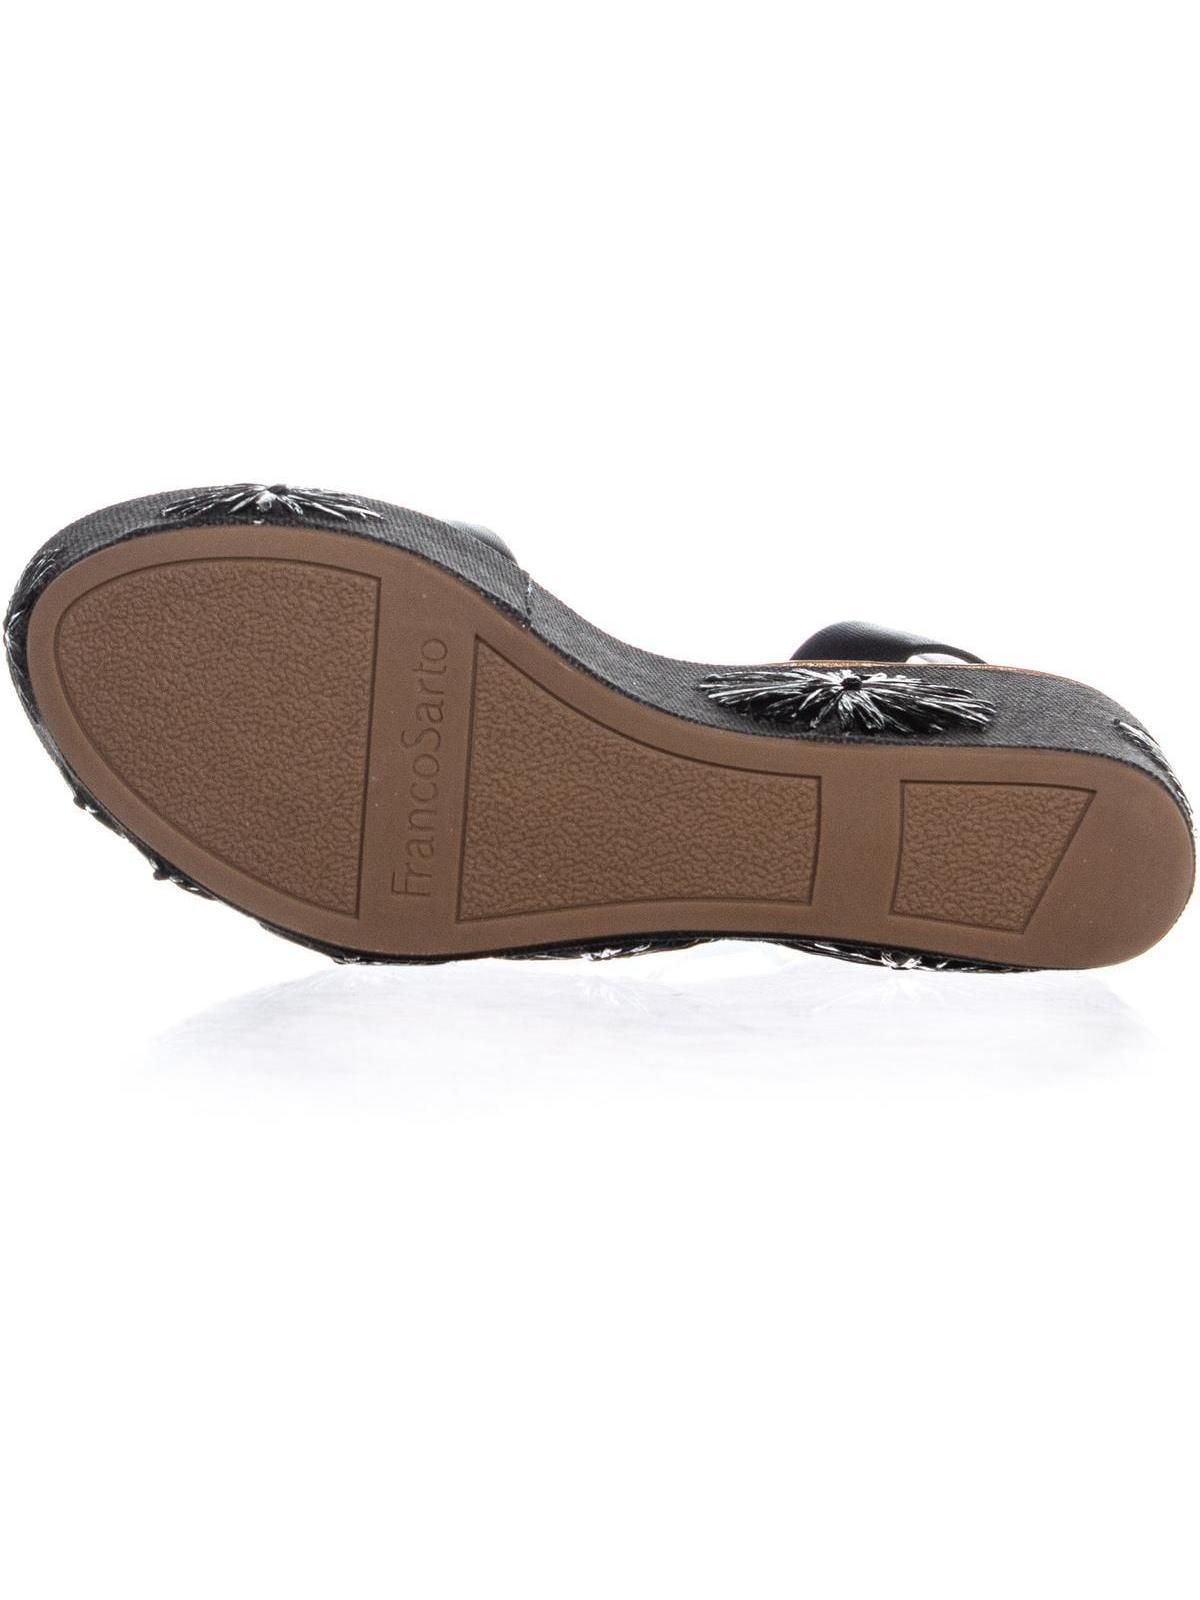 17b1ae917a7 Franco Sarto - Womens Franco Sarto Jovie Platform Wedge Sandals ...